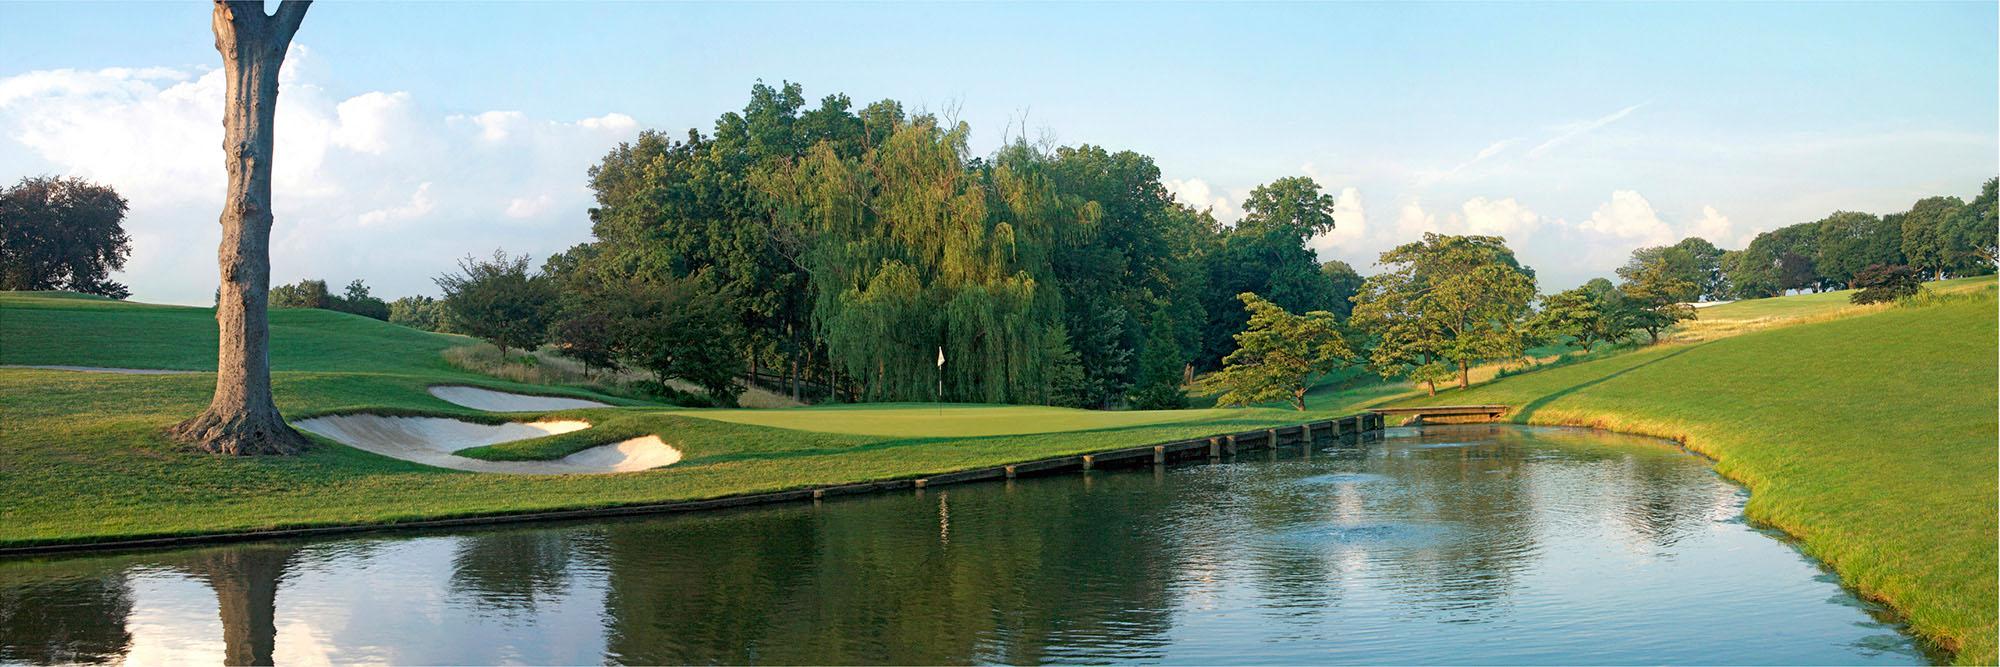 Golf Course Image - Philadelphia Country Club Springmill No. 5